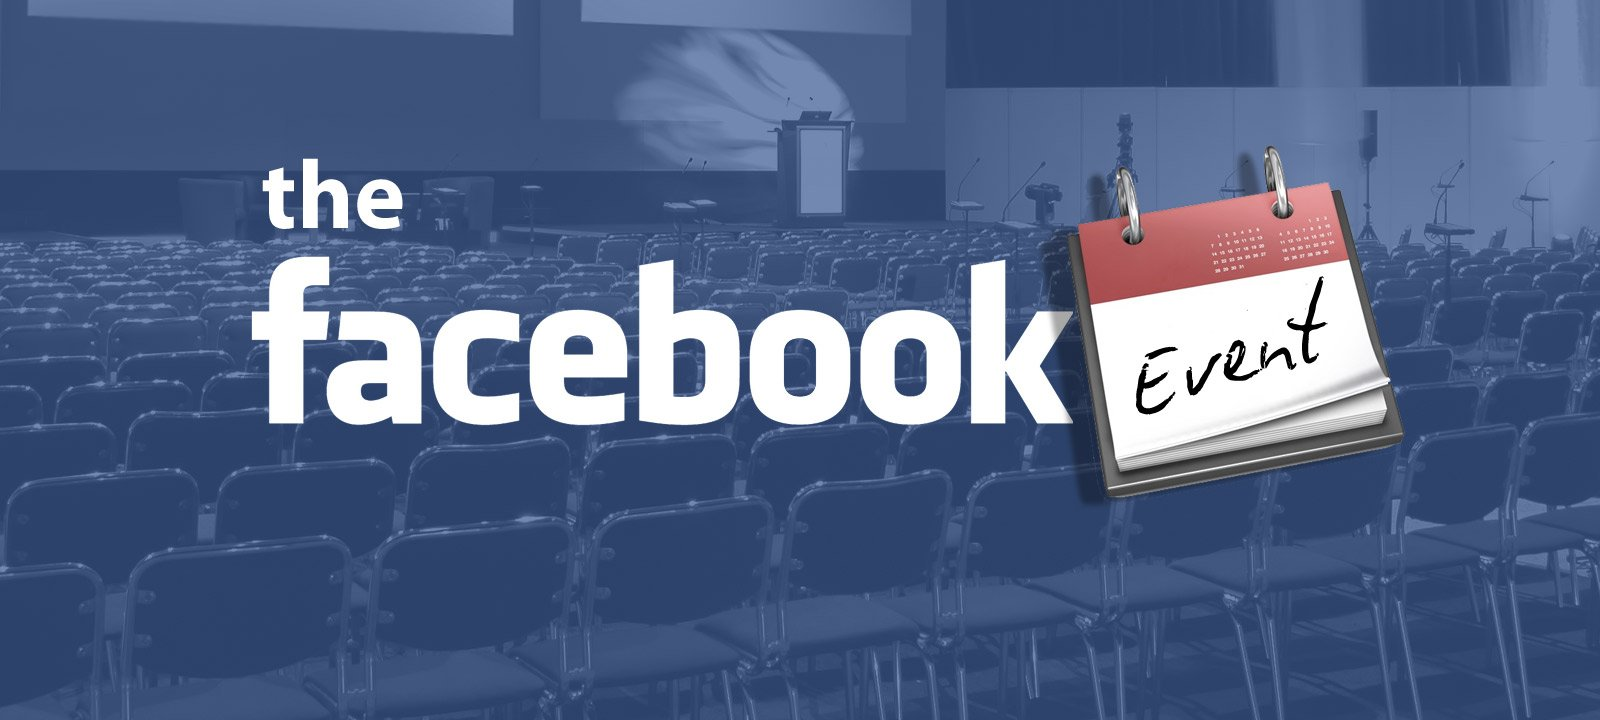 Un pequeño gran truco para invitar a todos tus amigos de Facebook a un evento